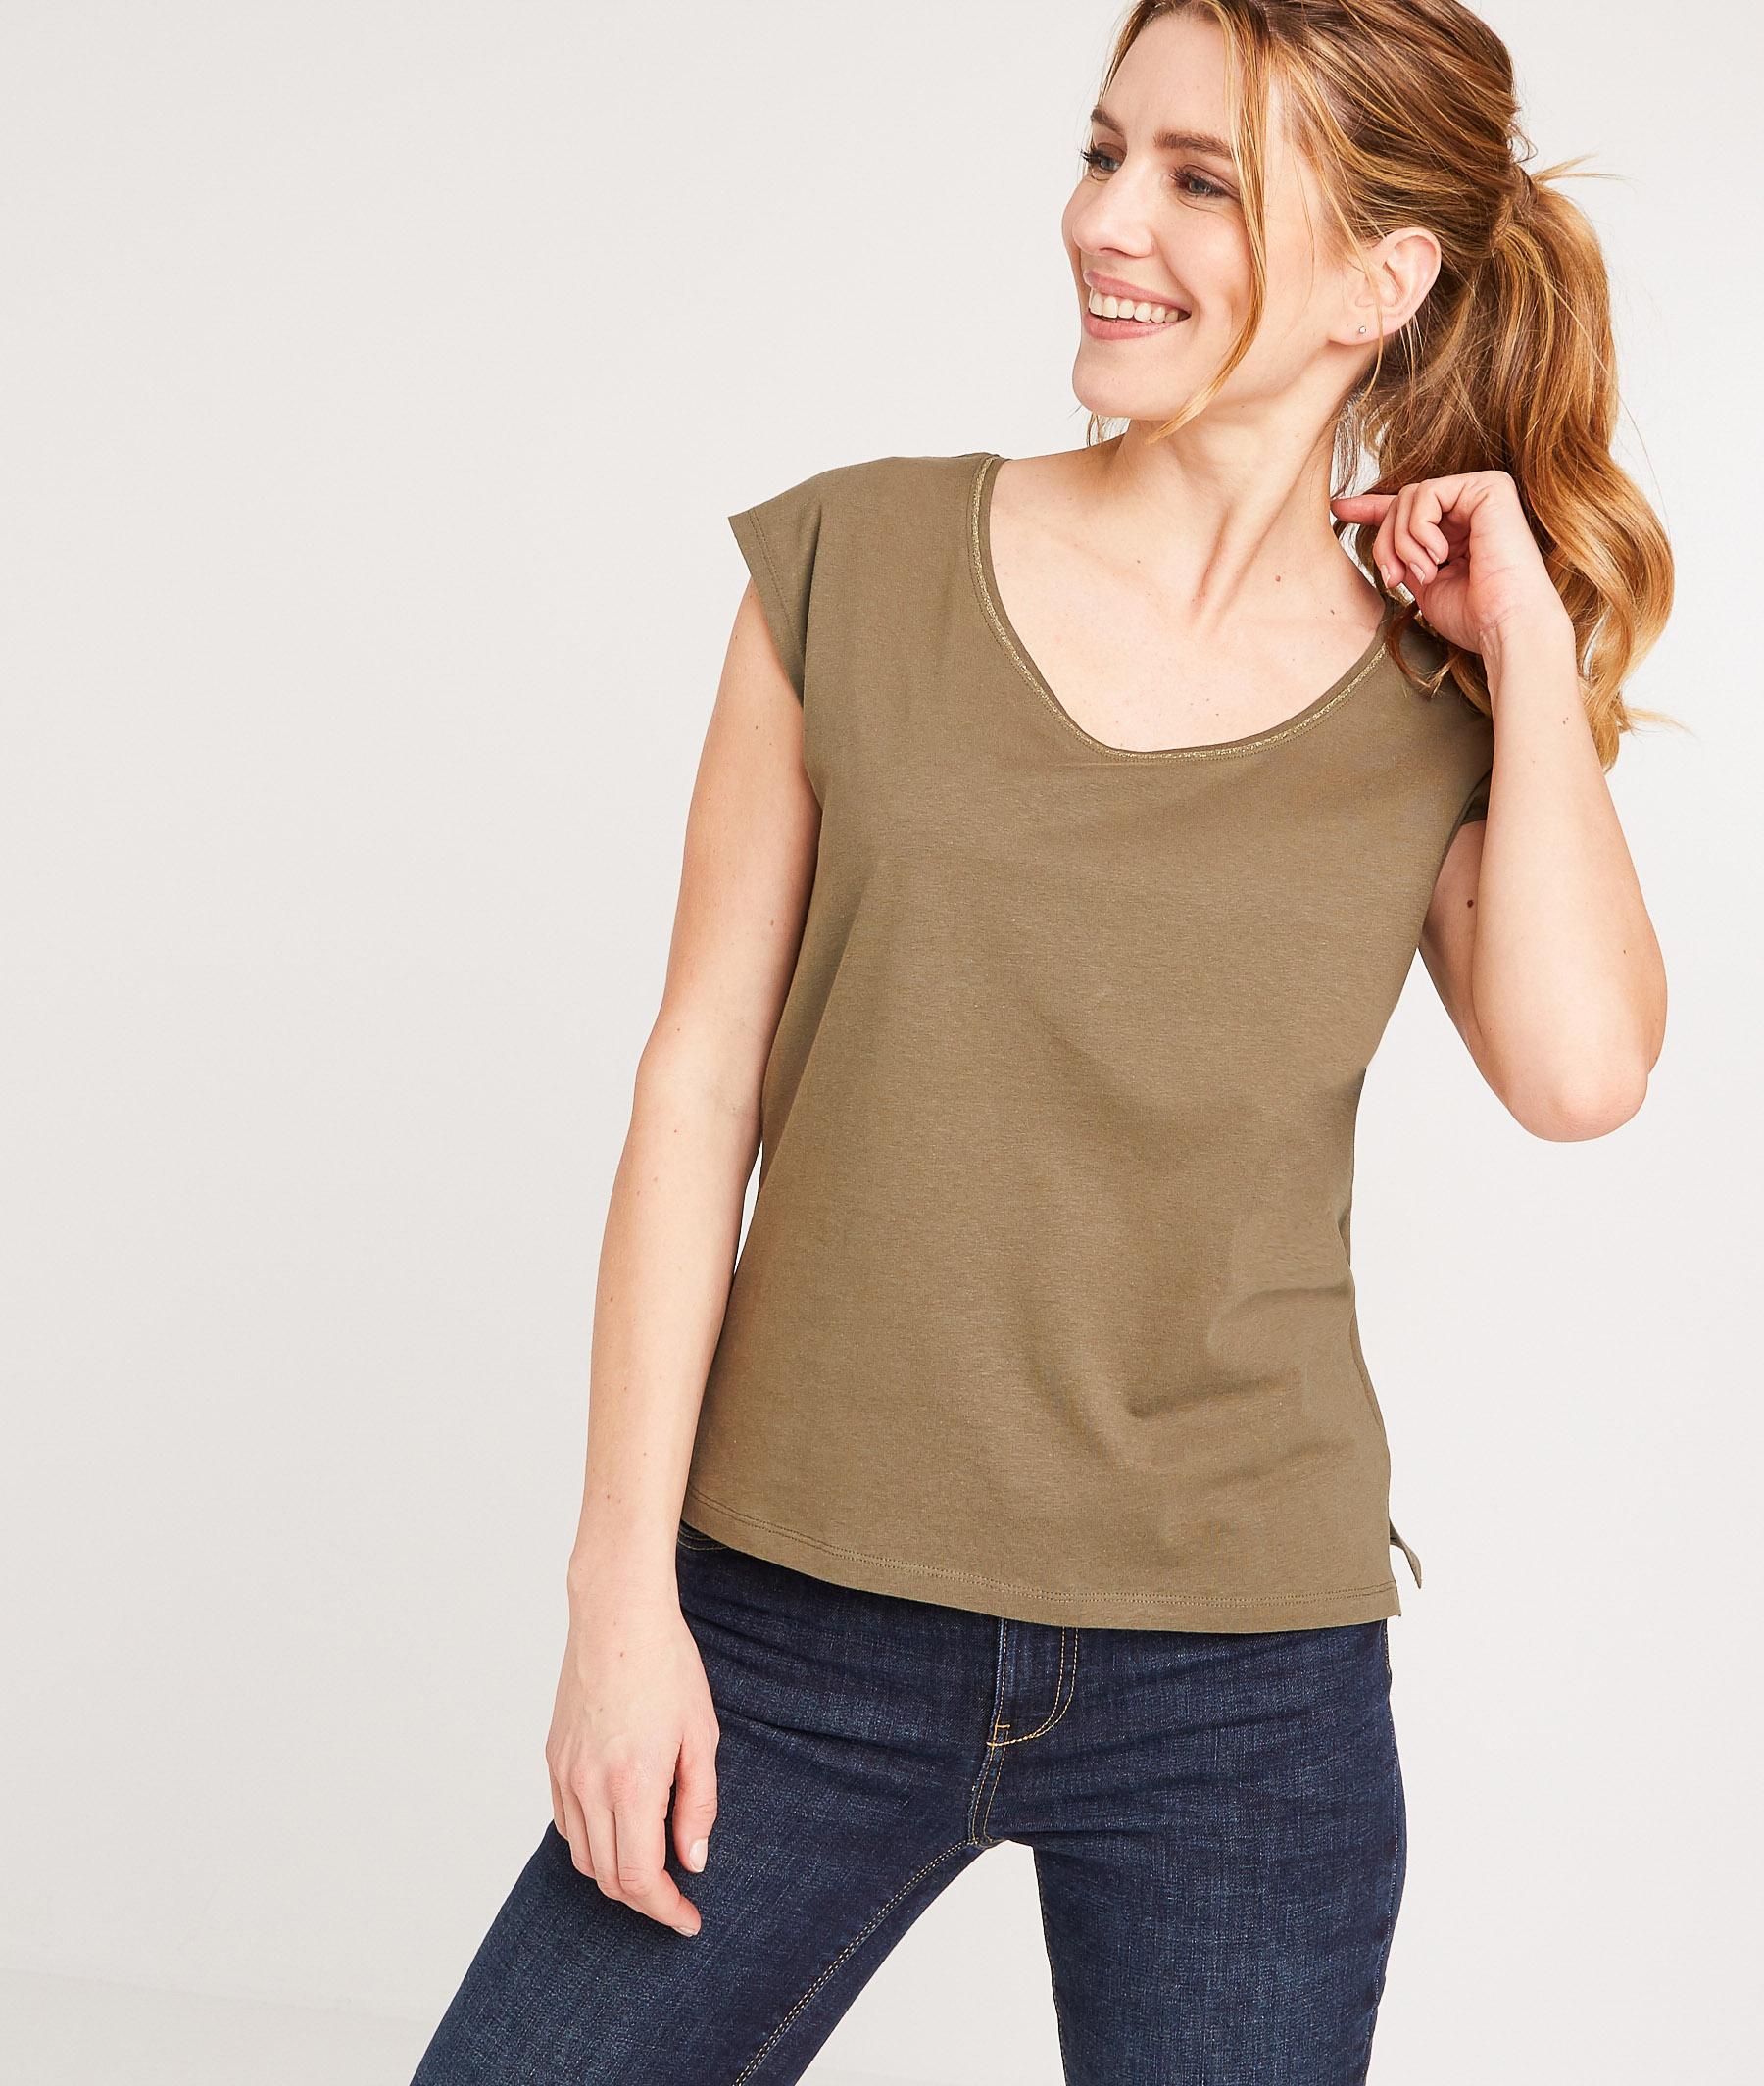 T-shirt en coton uni femme KAKI